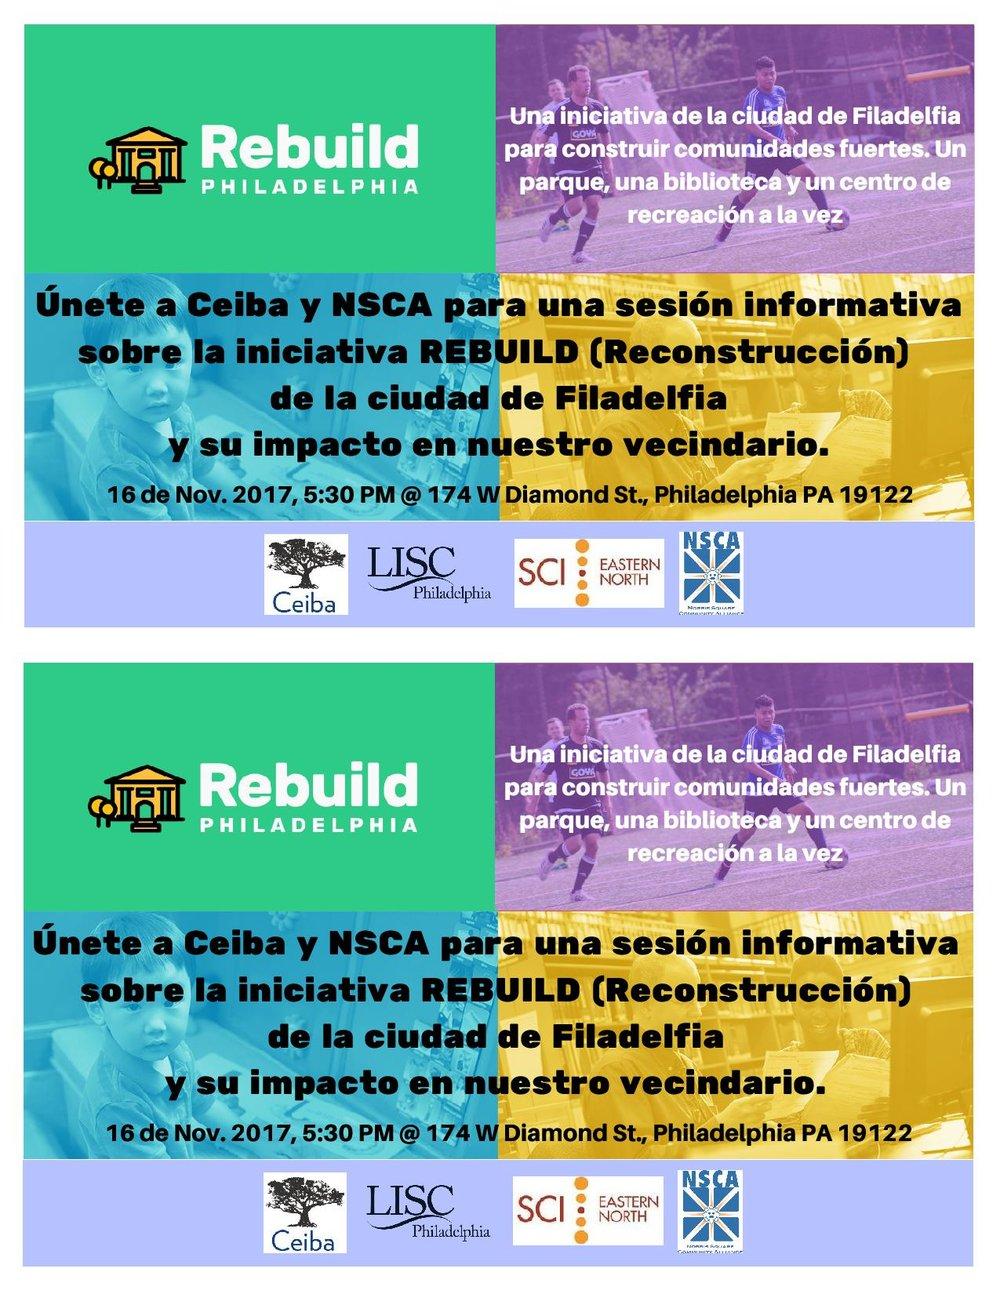 REBUILD flyer Spanish 11.6.2017 (3)-page-001.jpg